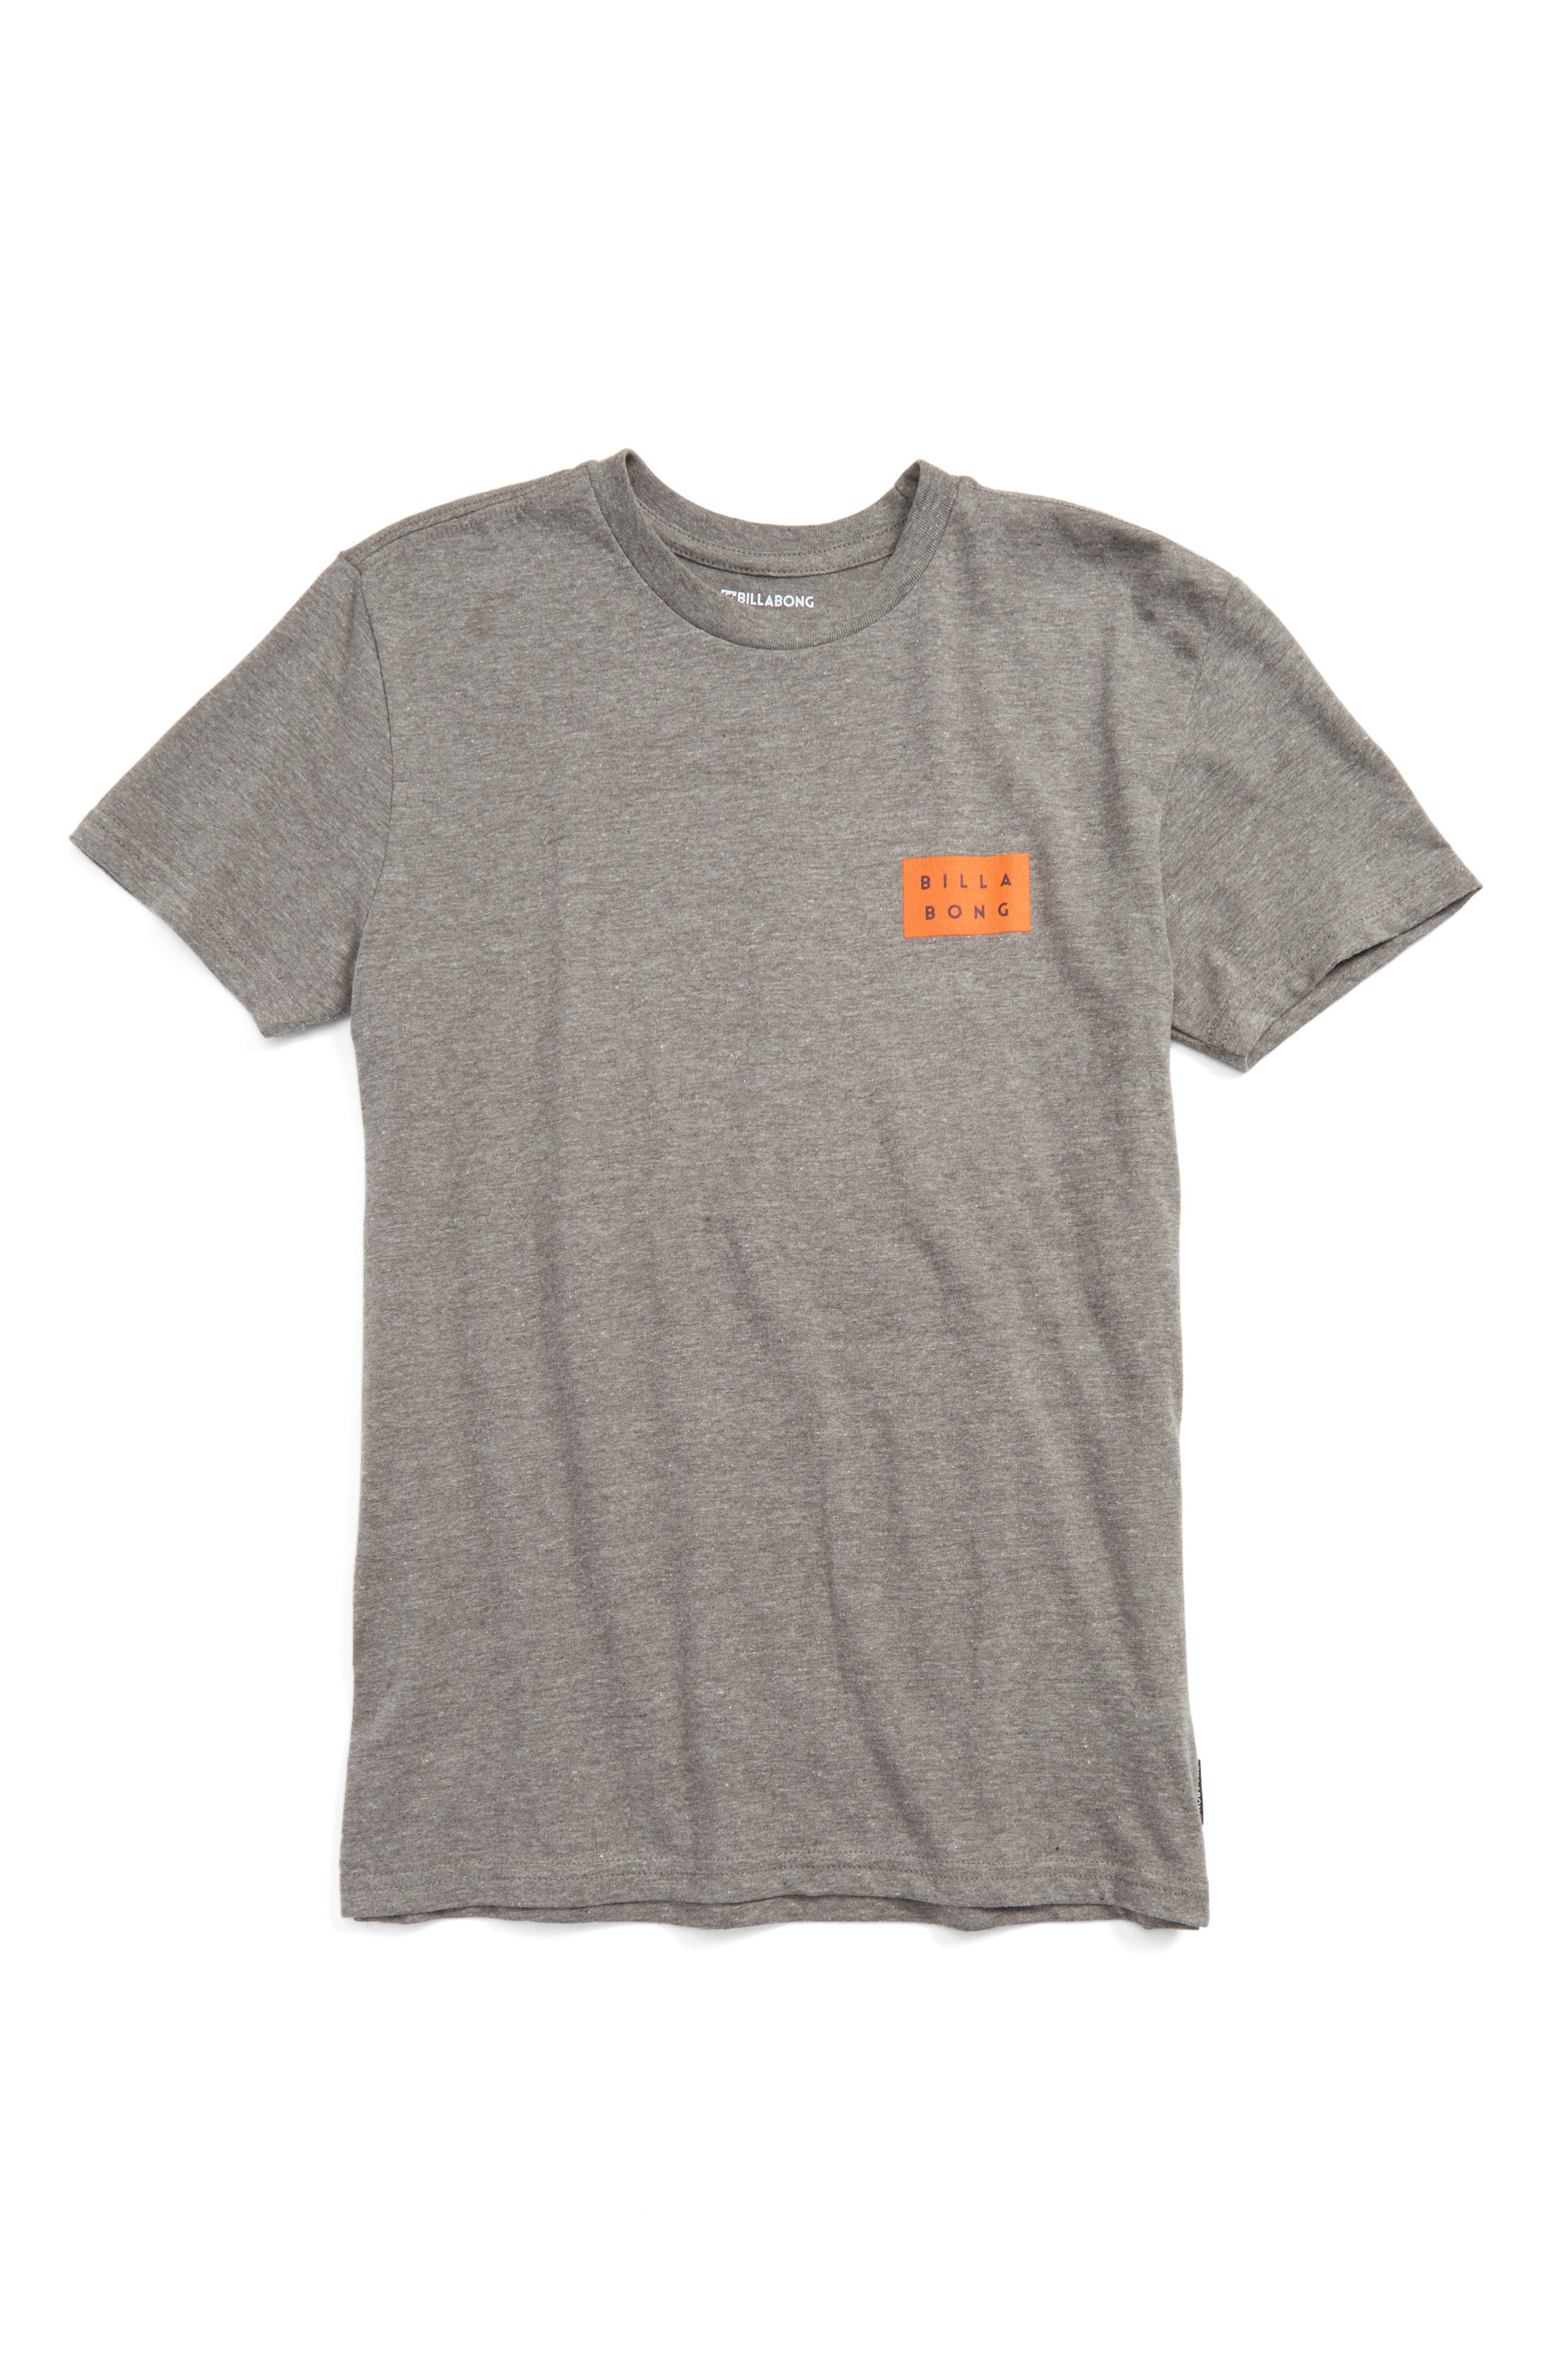 Billabong Fill Die Cut T-Shirt (Big Boys)